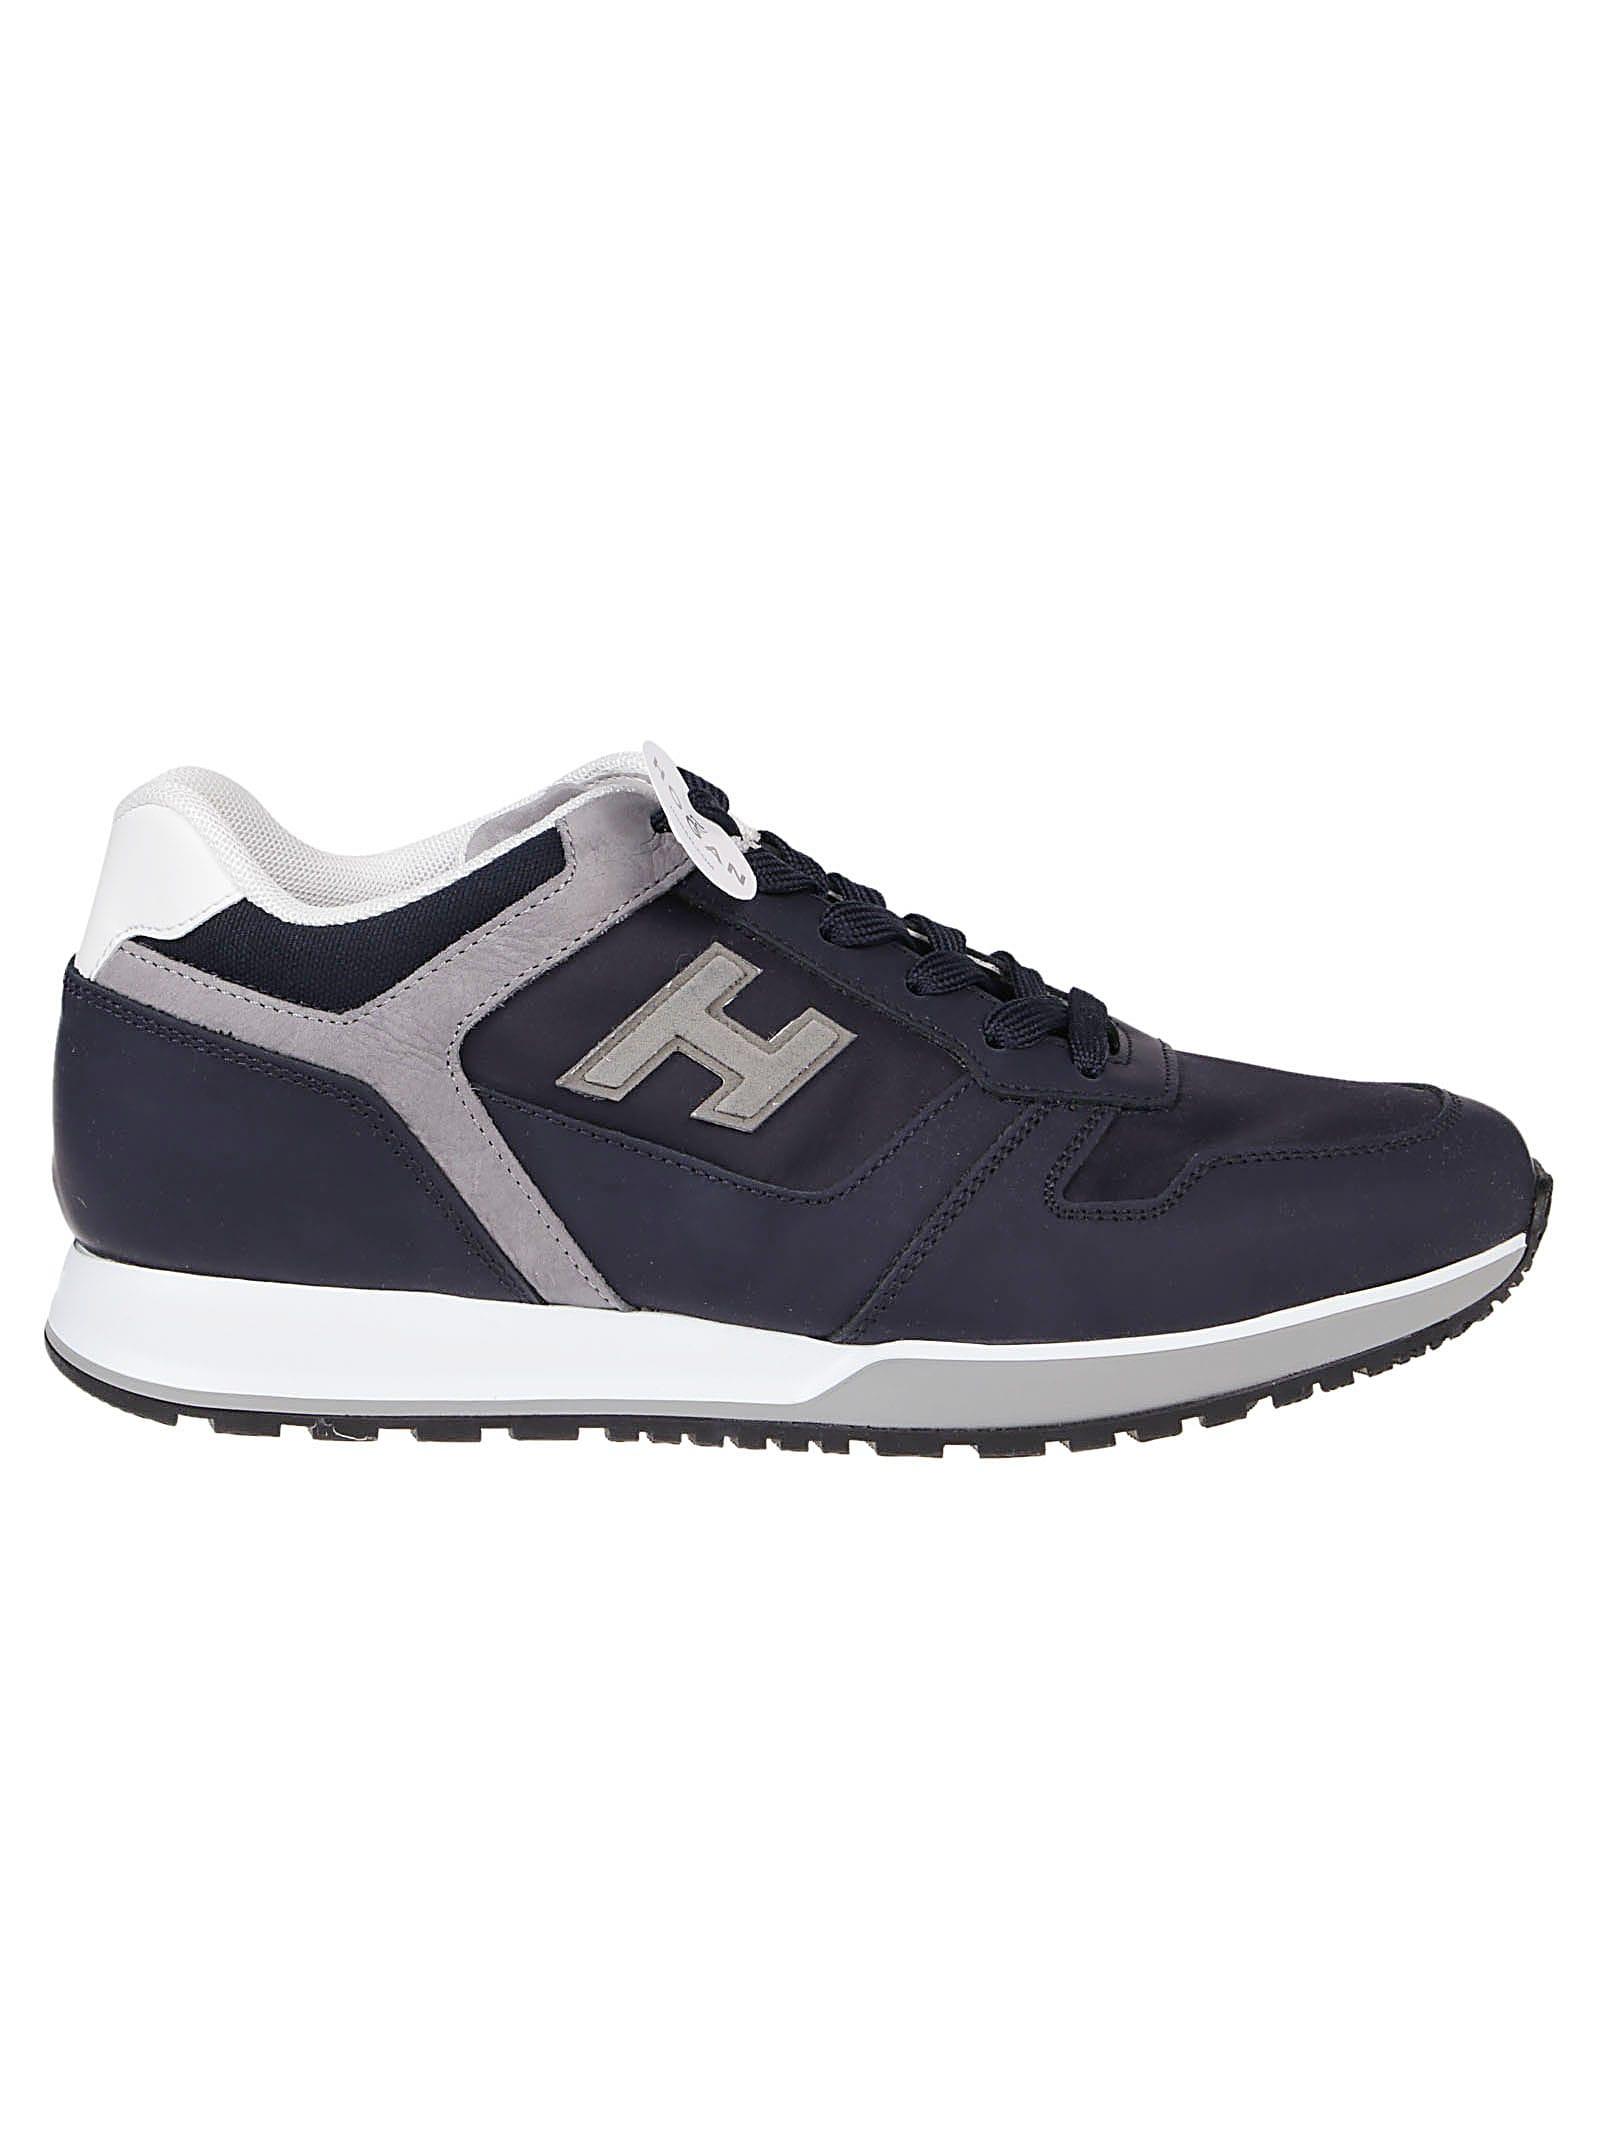 Hogan H321 Running Sneaker